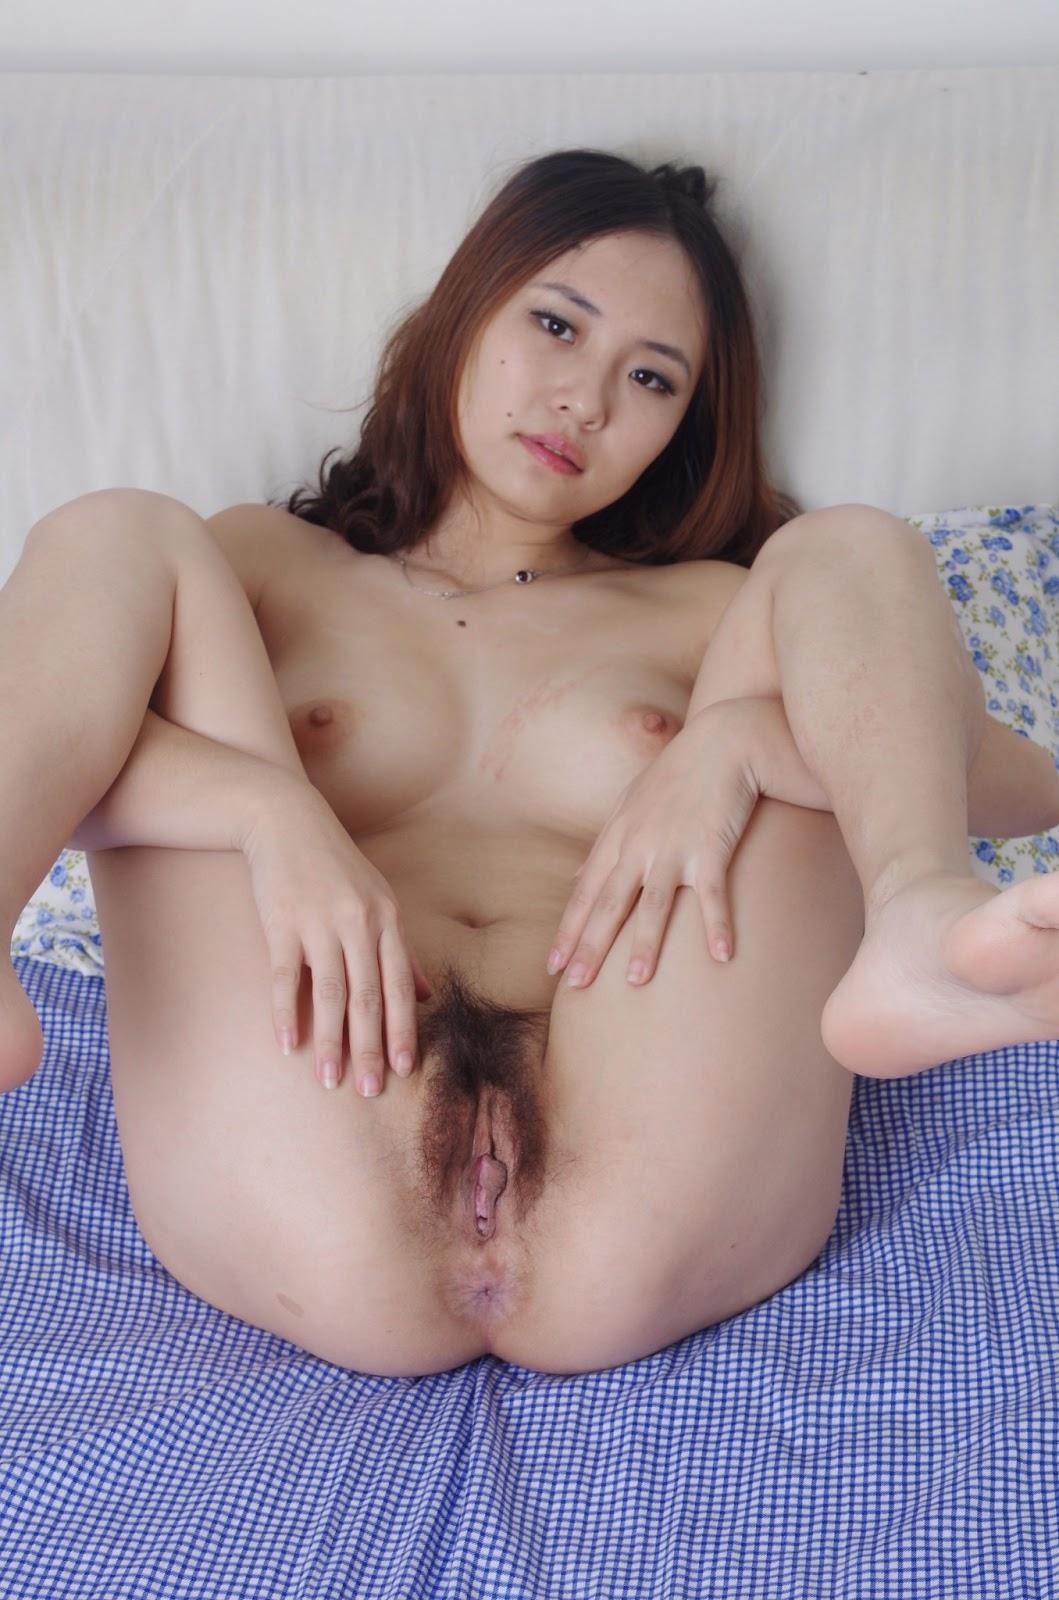 Fad 30 Cute Asian Nude Girl